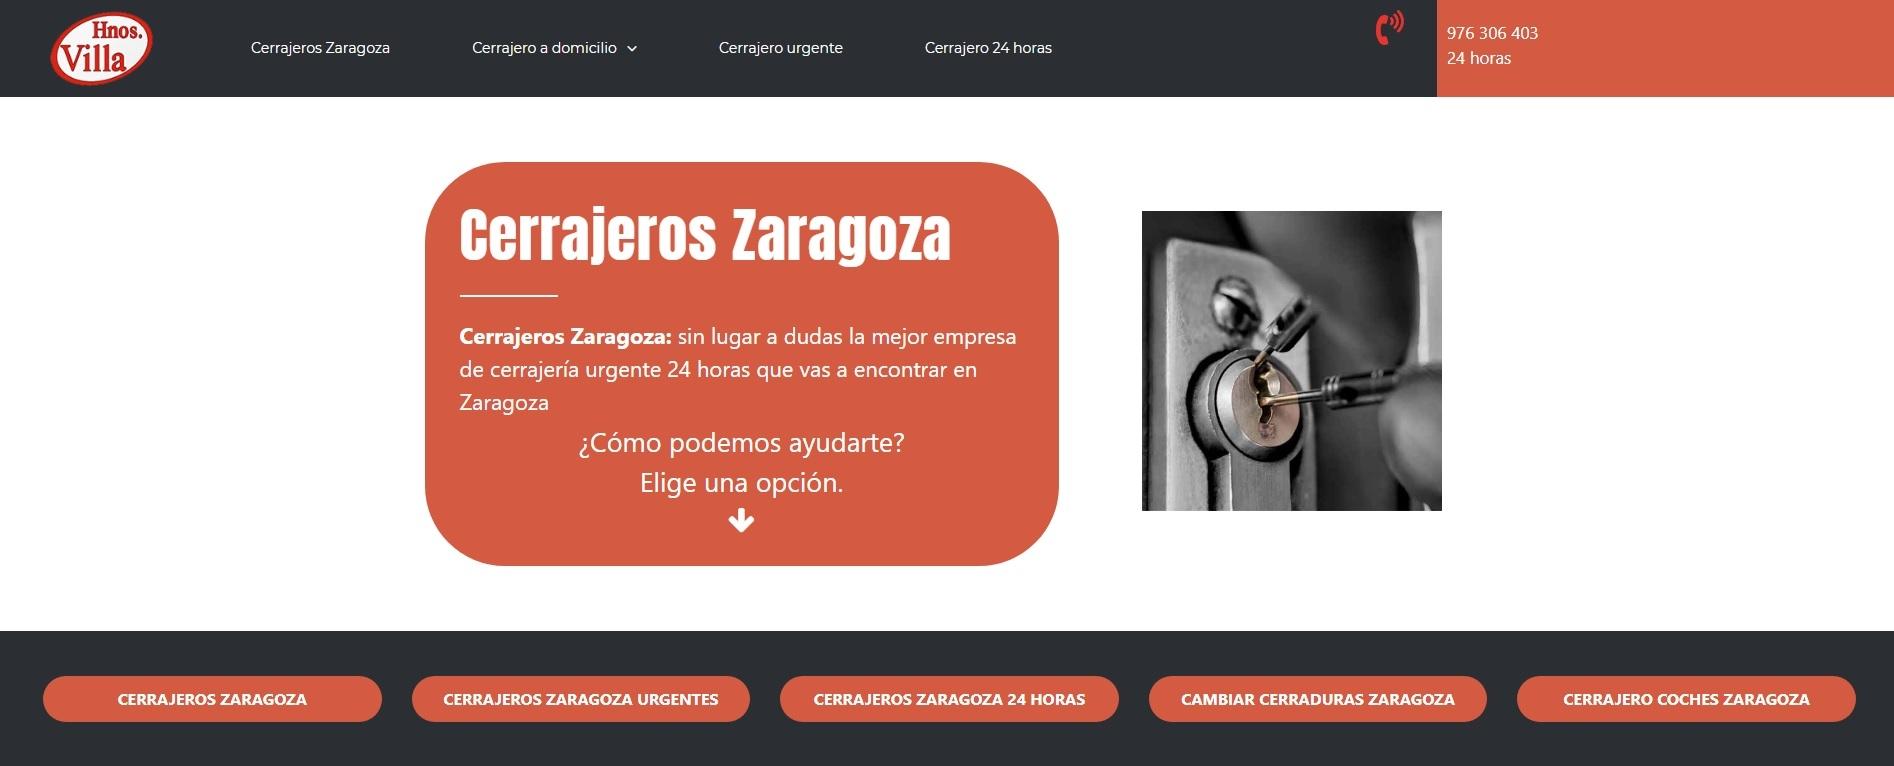 Cerrajeros Zaragoza (@cerrajeroszaragoza) Cover Image